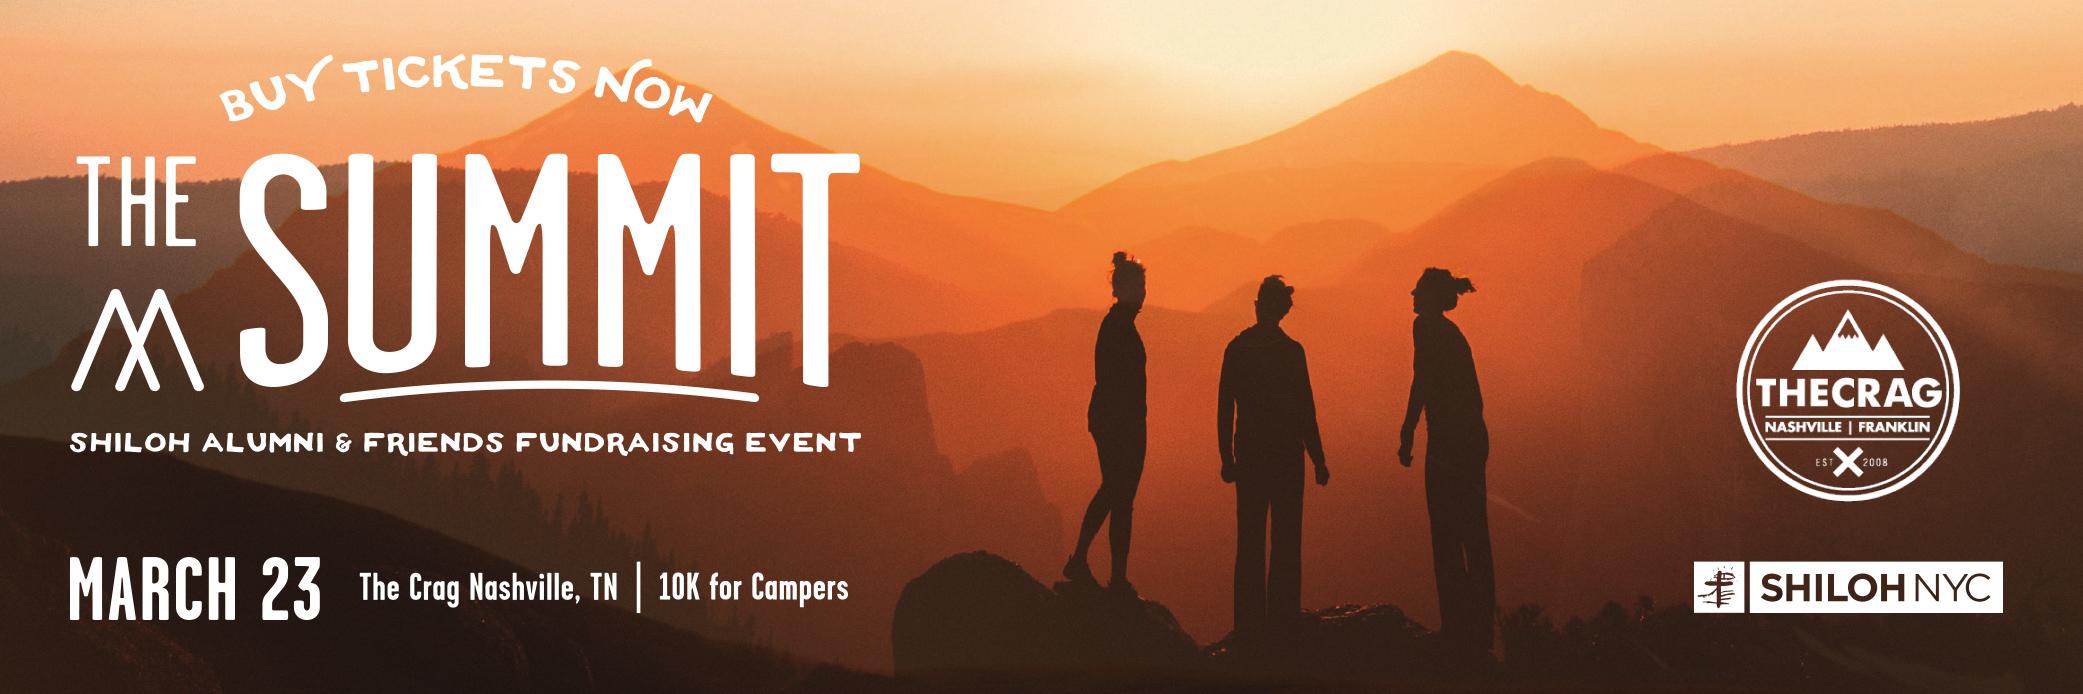 Summit-Webheader.jpg